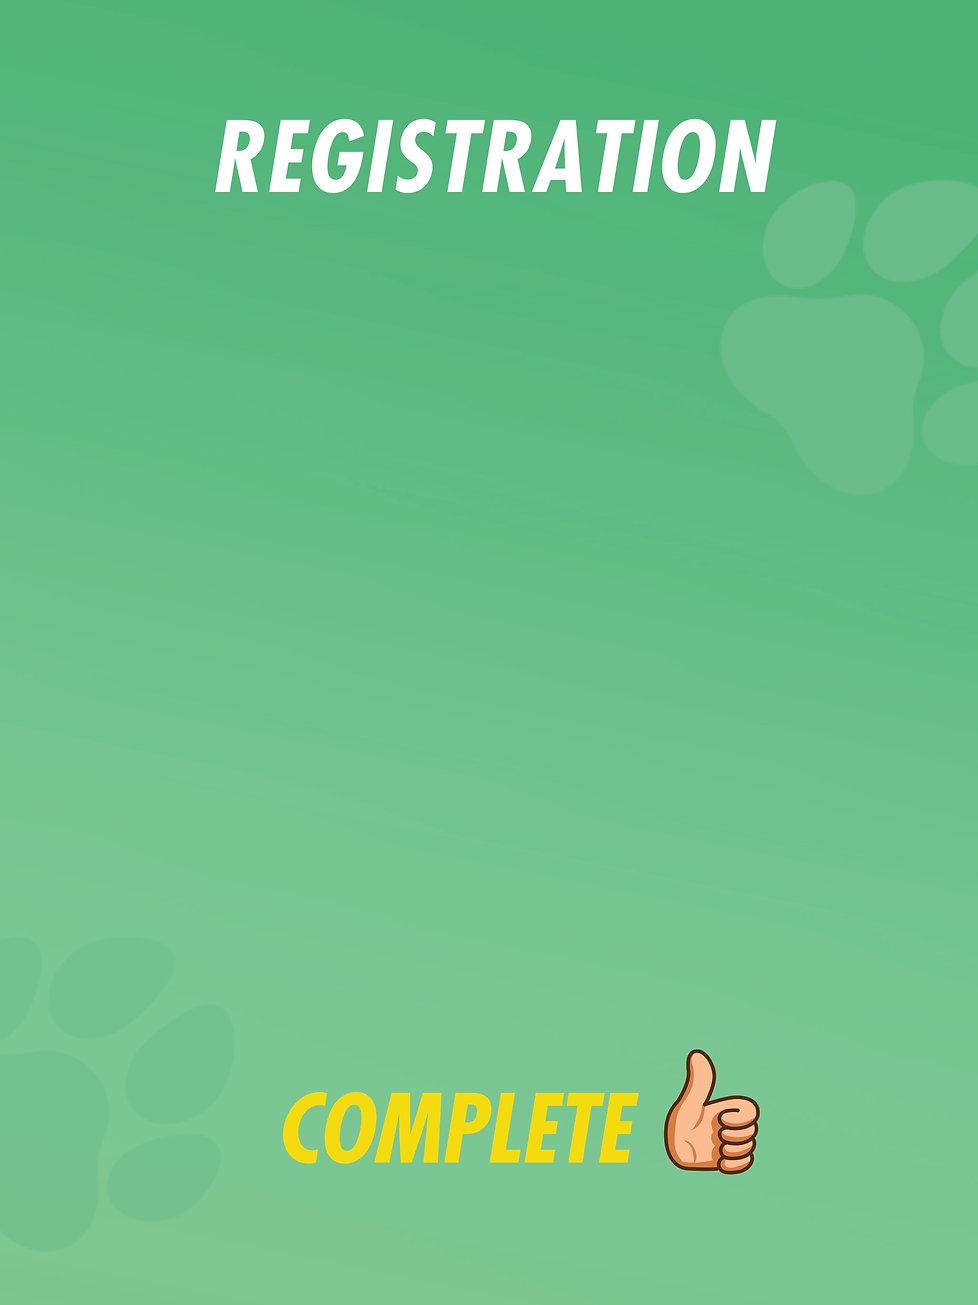 5_iPad_Registration_1.jpg